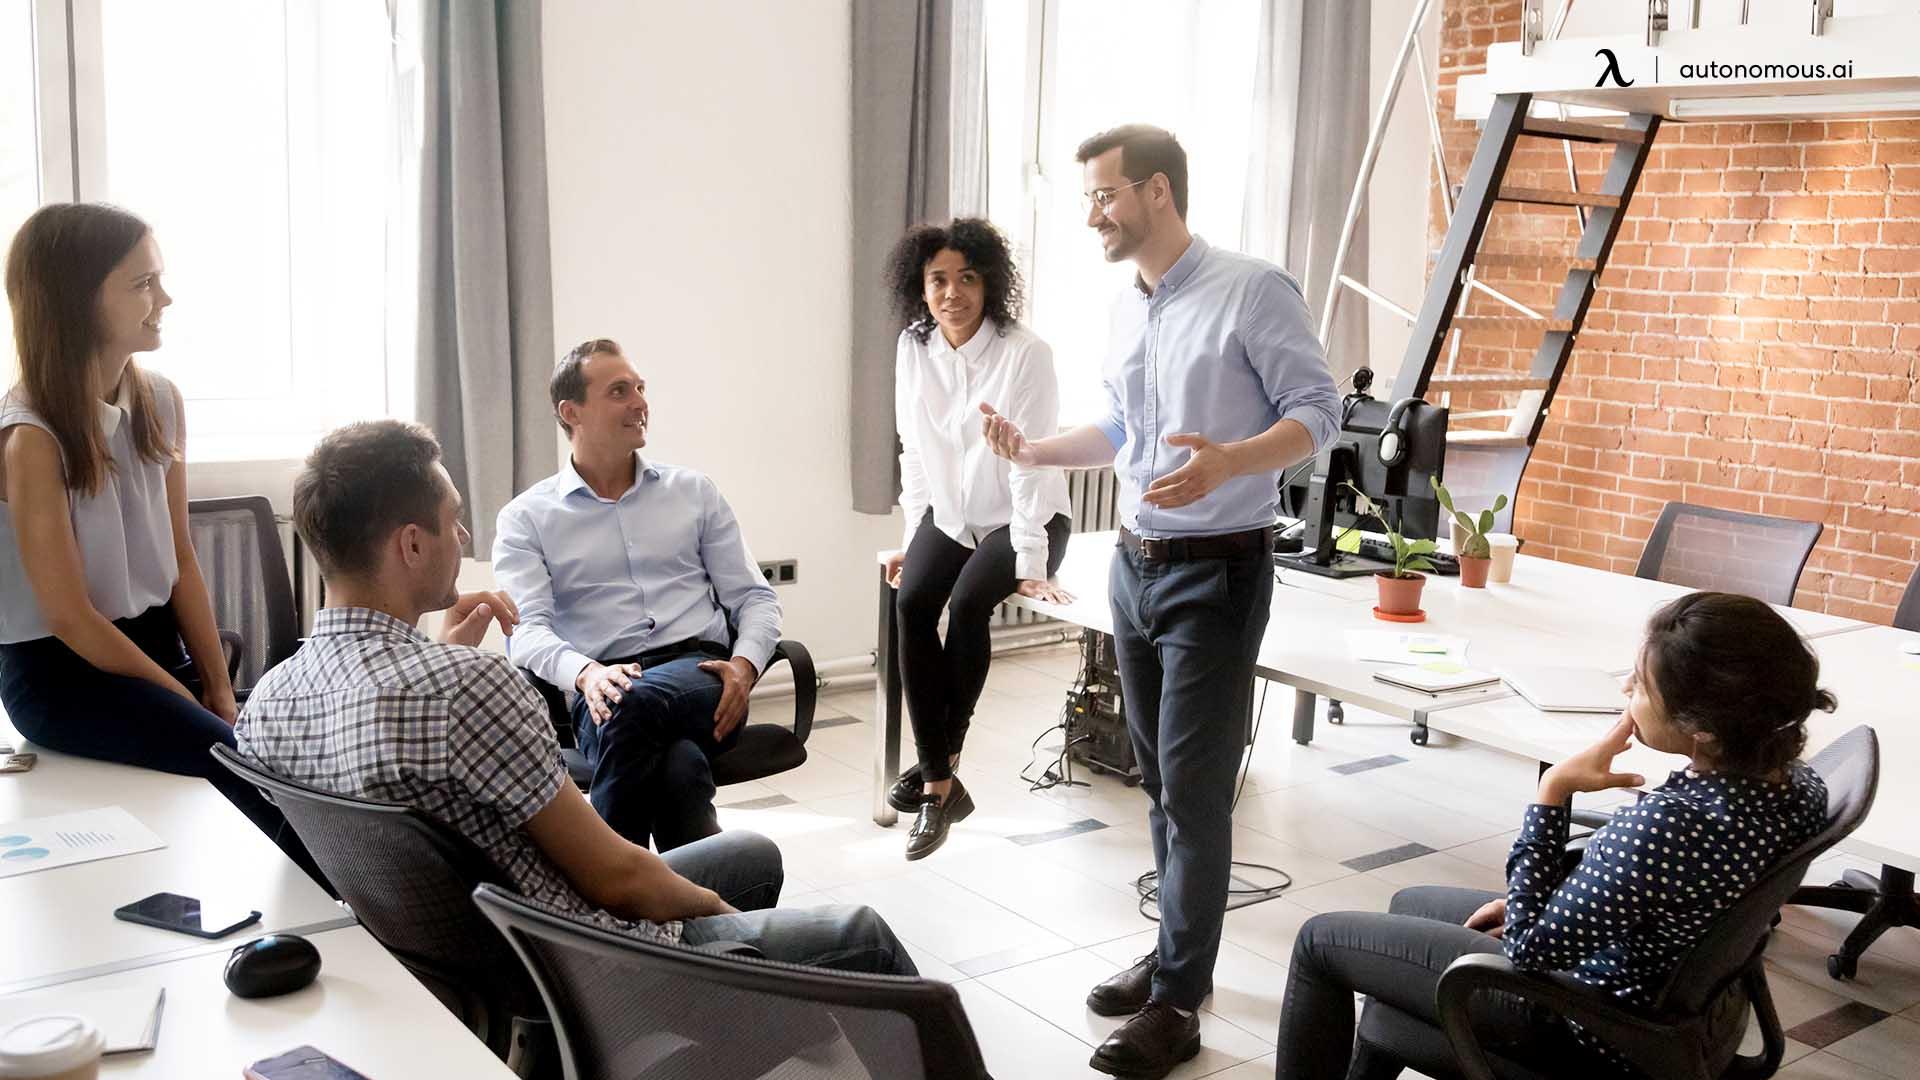 How Do You Make a Flexible Work Program?